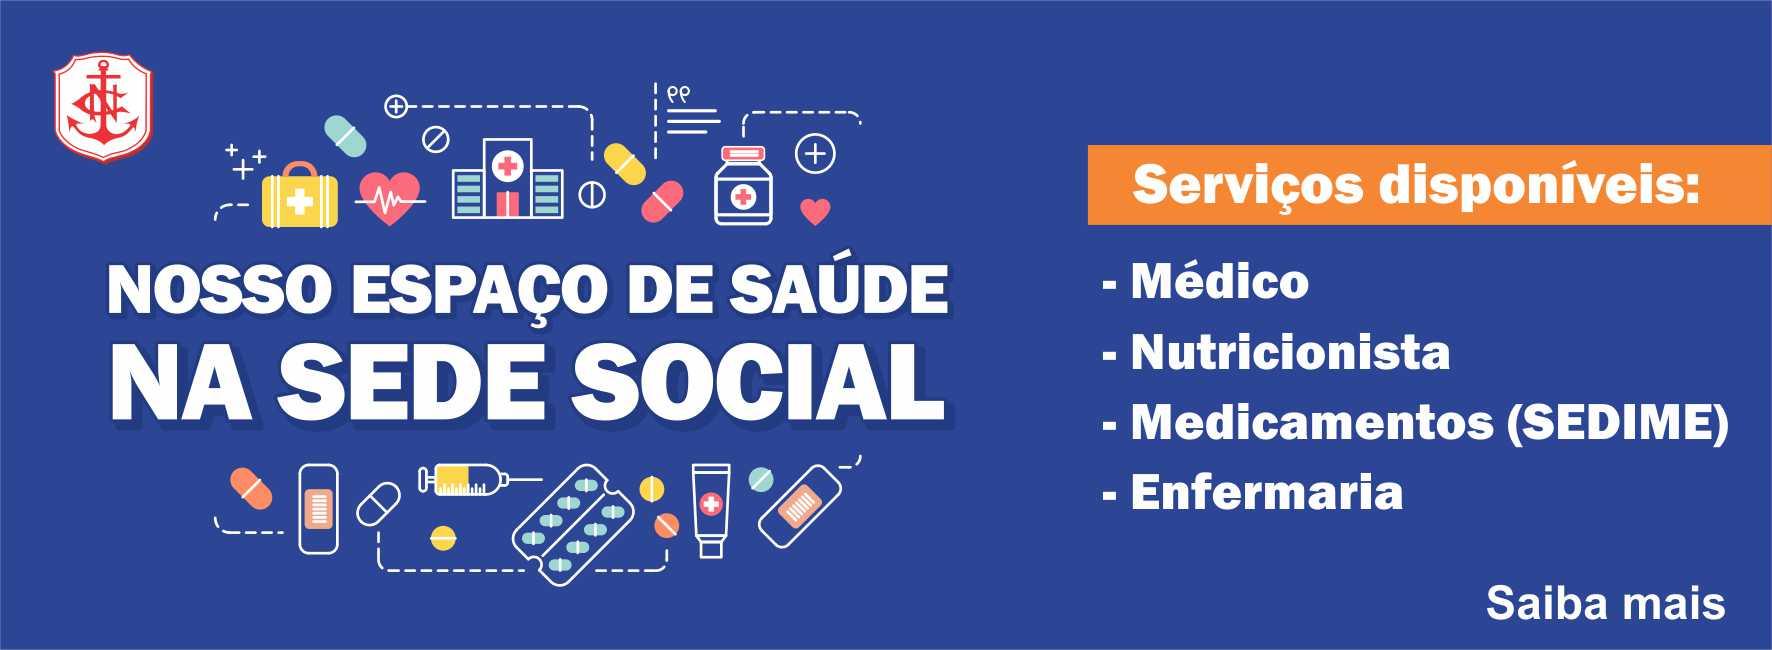 https://www.clubenaval.org.br/novo/?q=espa%C3%A7o-de-sa%C3%BAde-na-sede-social